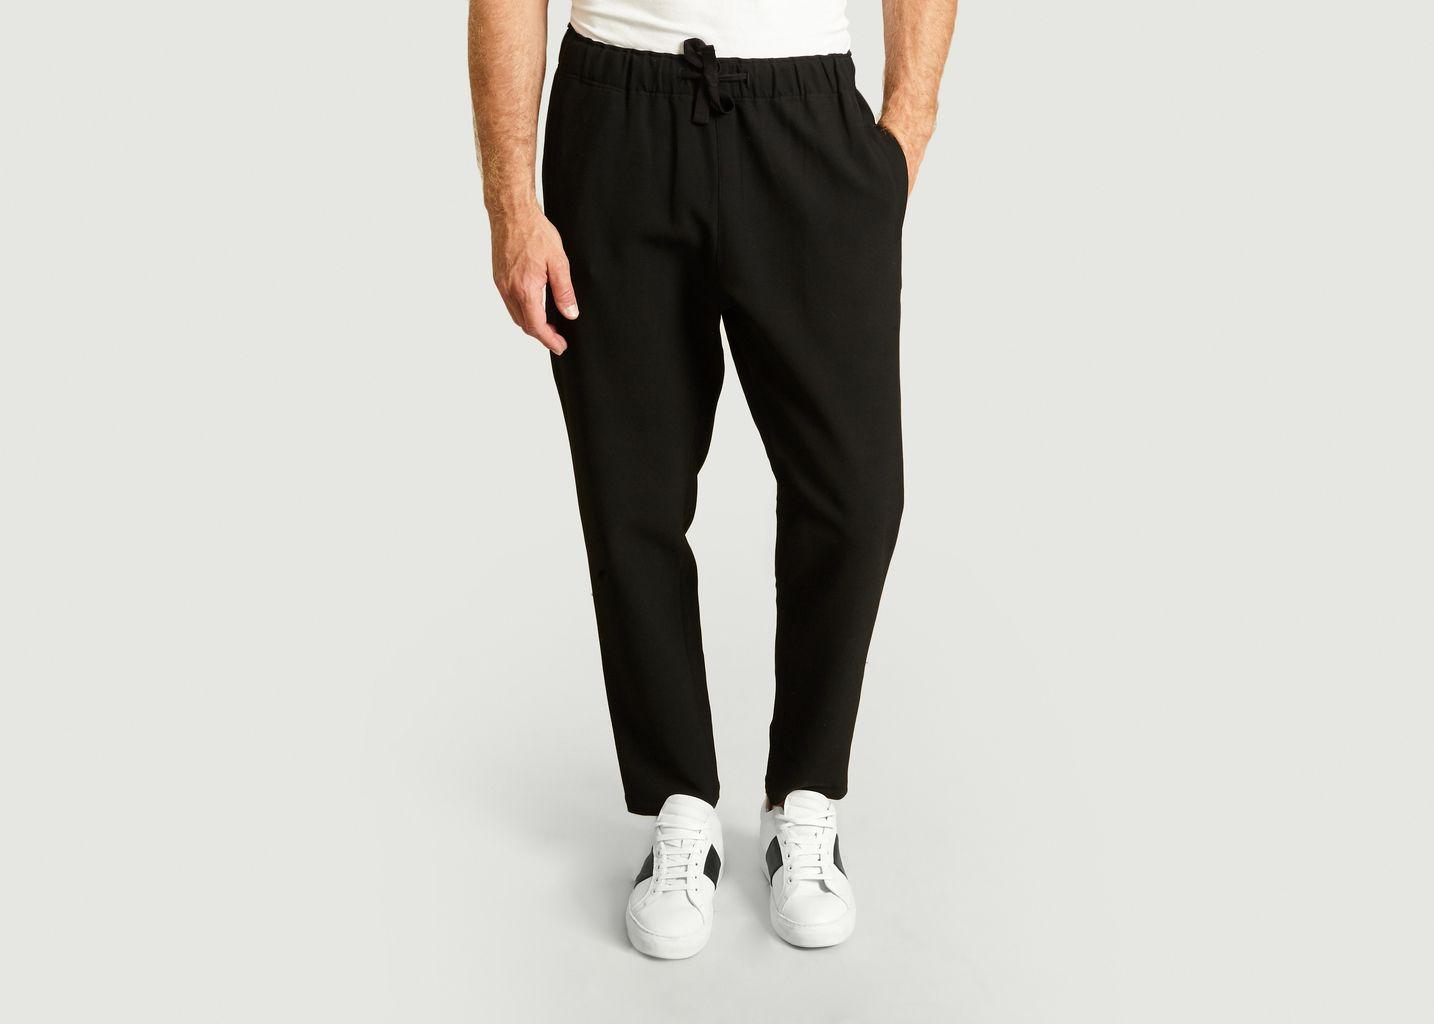 Pantalon Training - Loreak Mendian